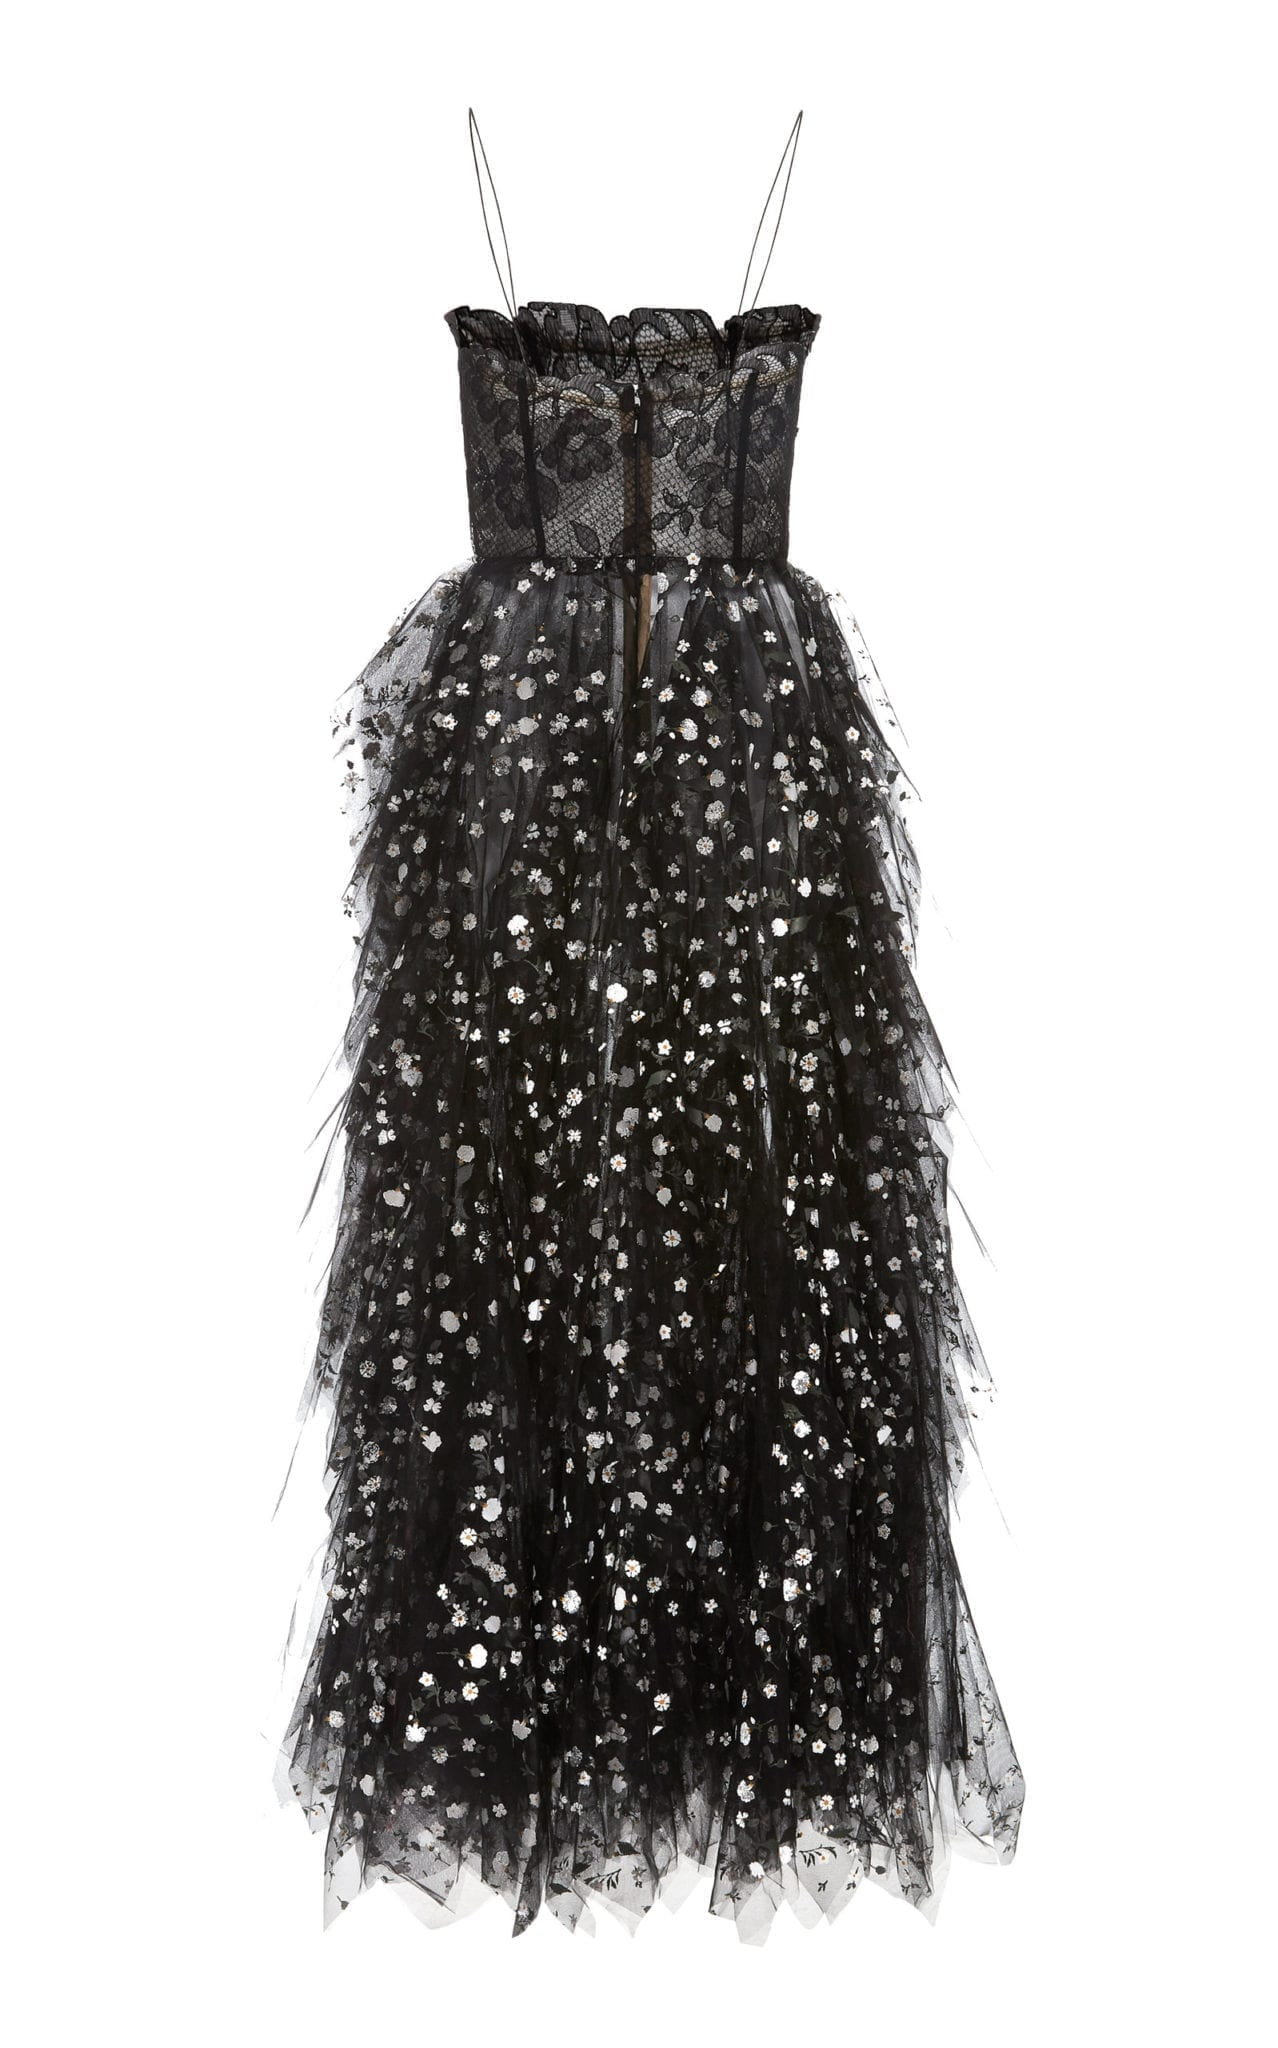 OSCAR DE LA RENTA Sequin-Embellished Lace And Tulle Midi Black Dress